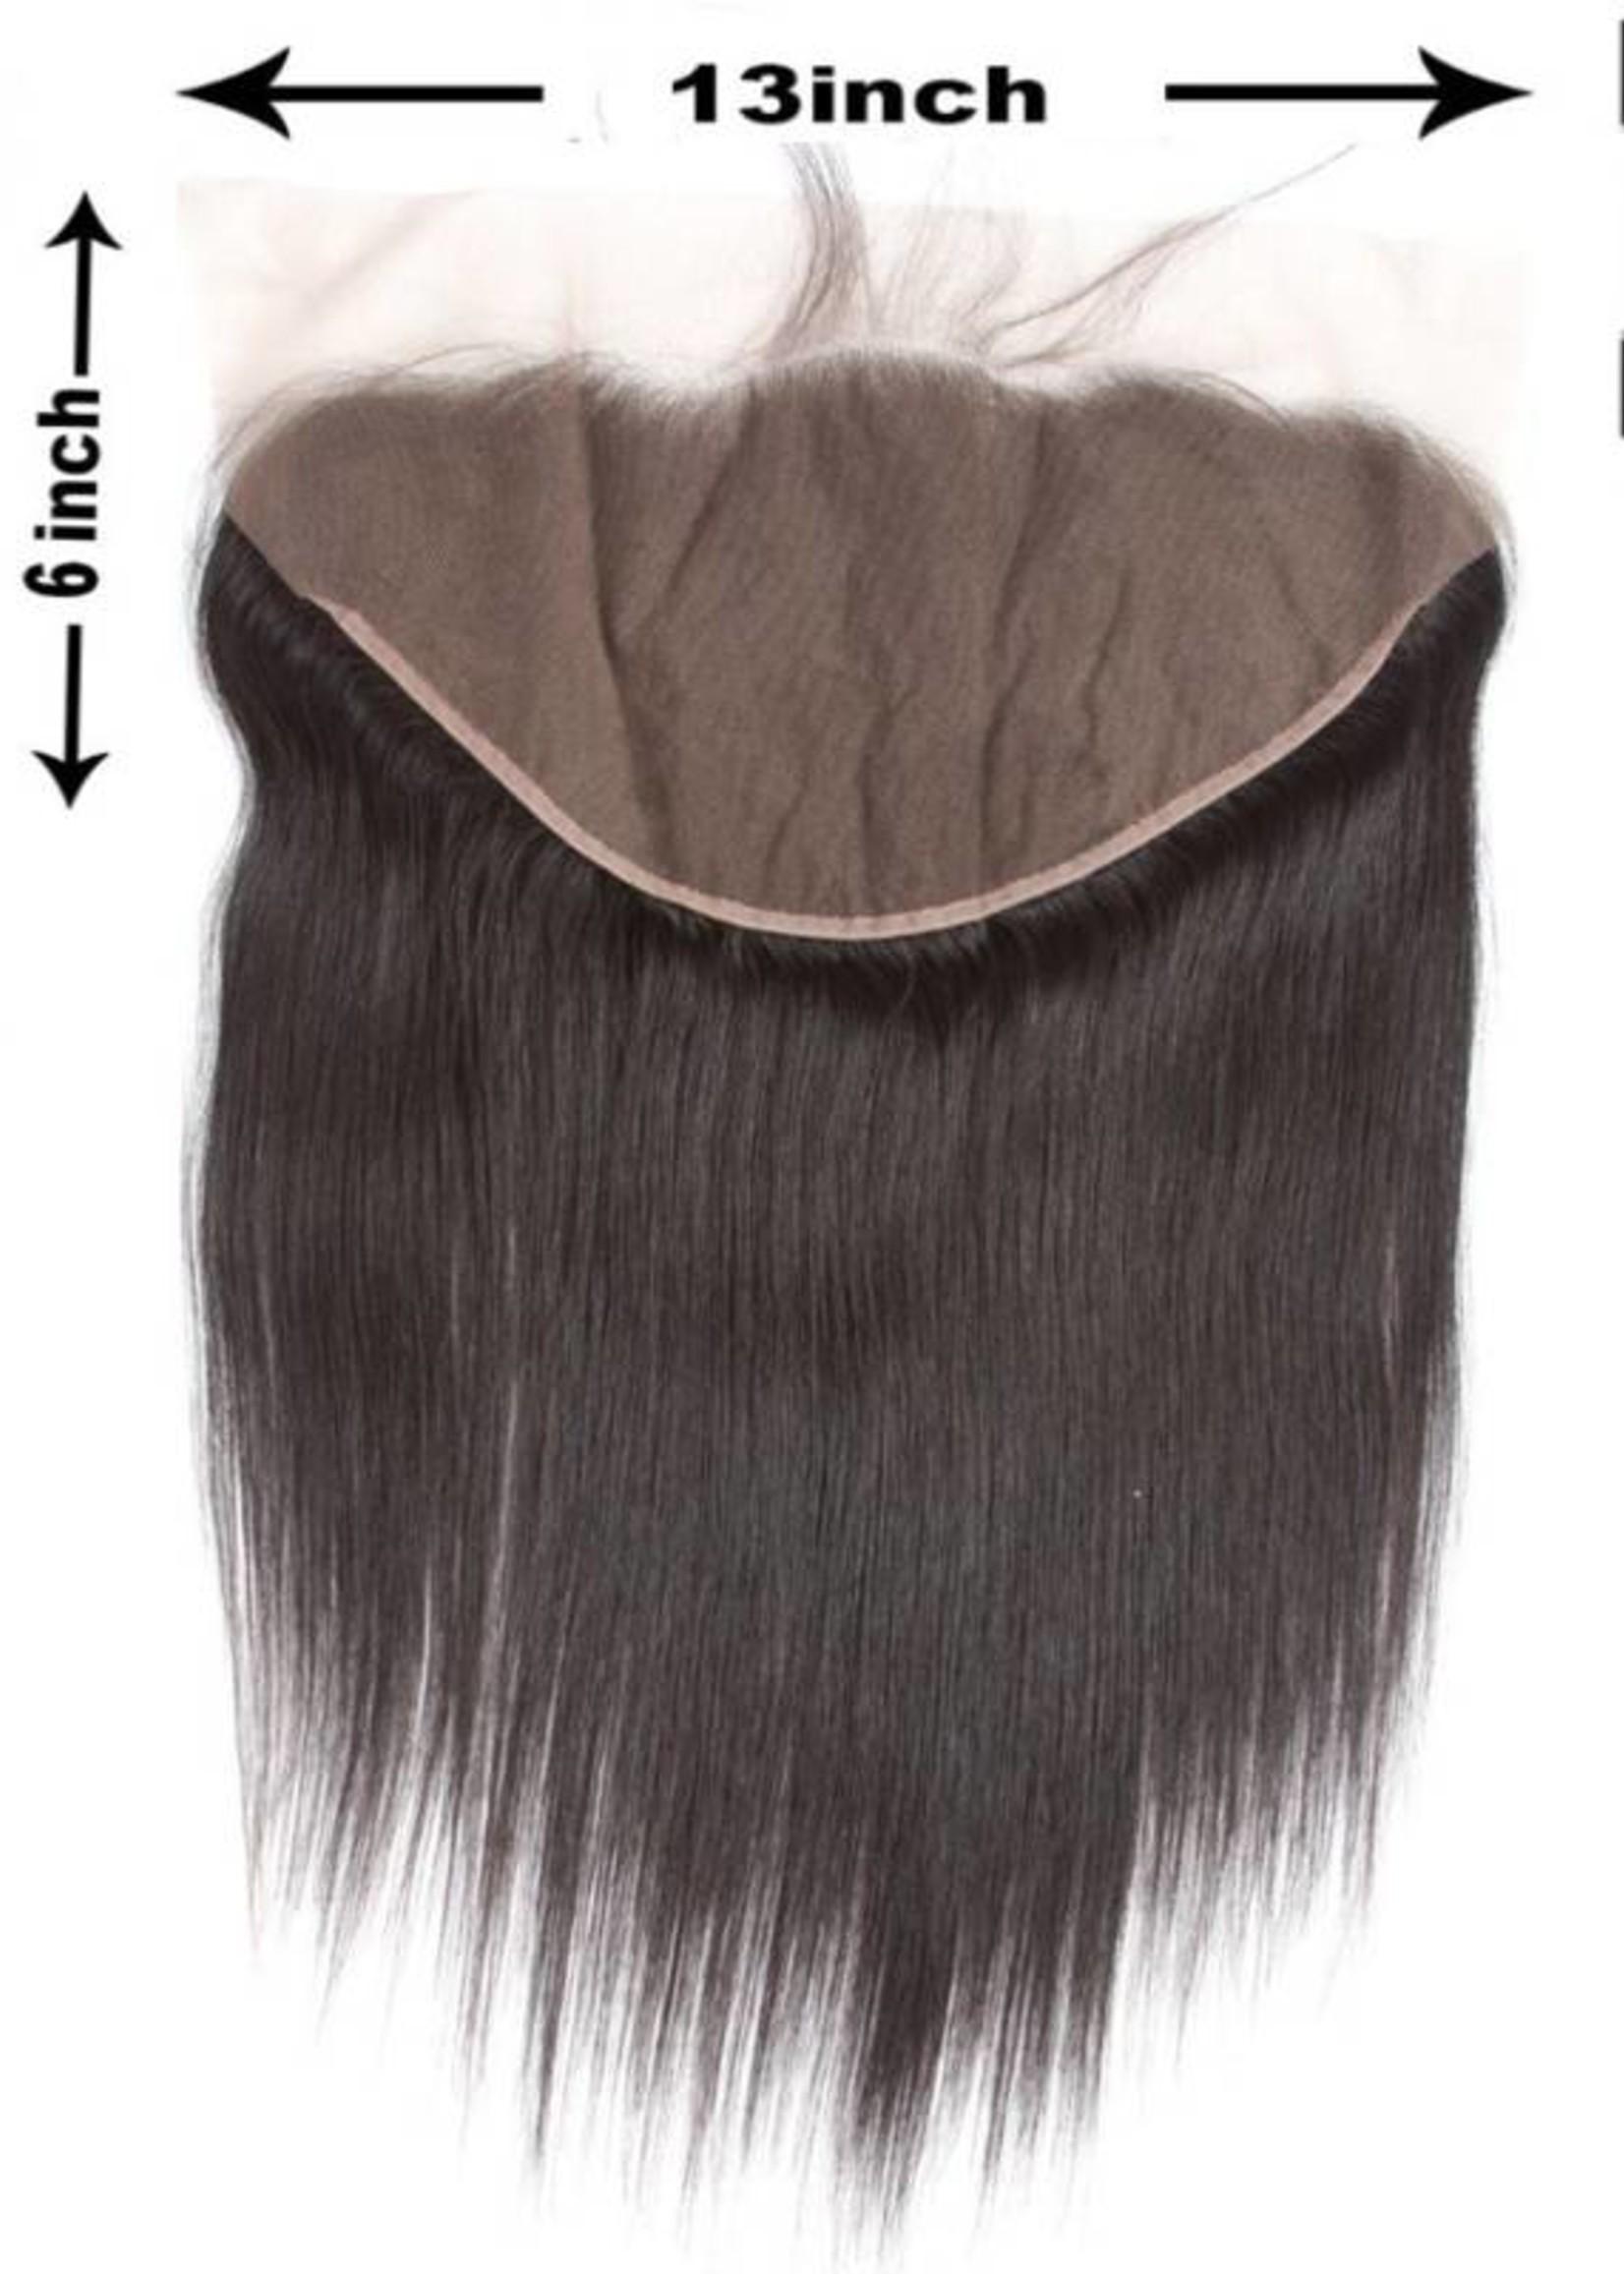 100% Virgin Hair Frontal (Steil) 14 inch